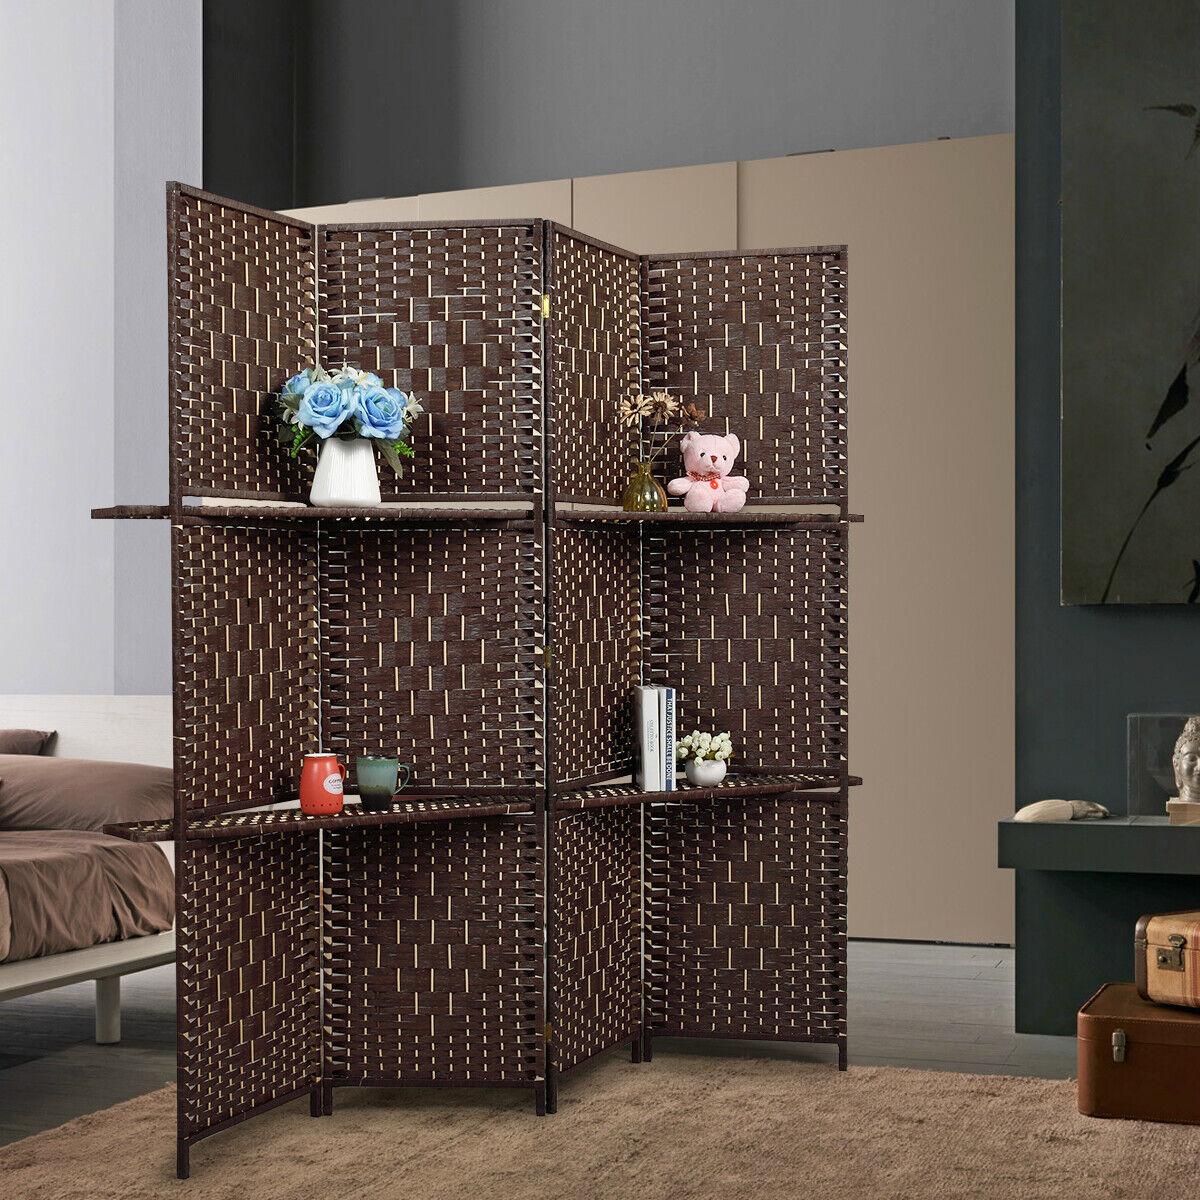 4 Panel Room Divider w/4 Display Shelves 5.9ft Folding Frees